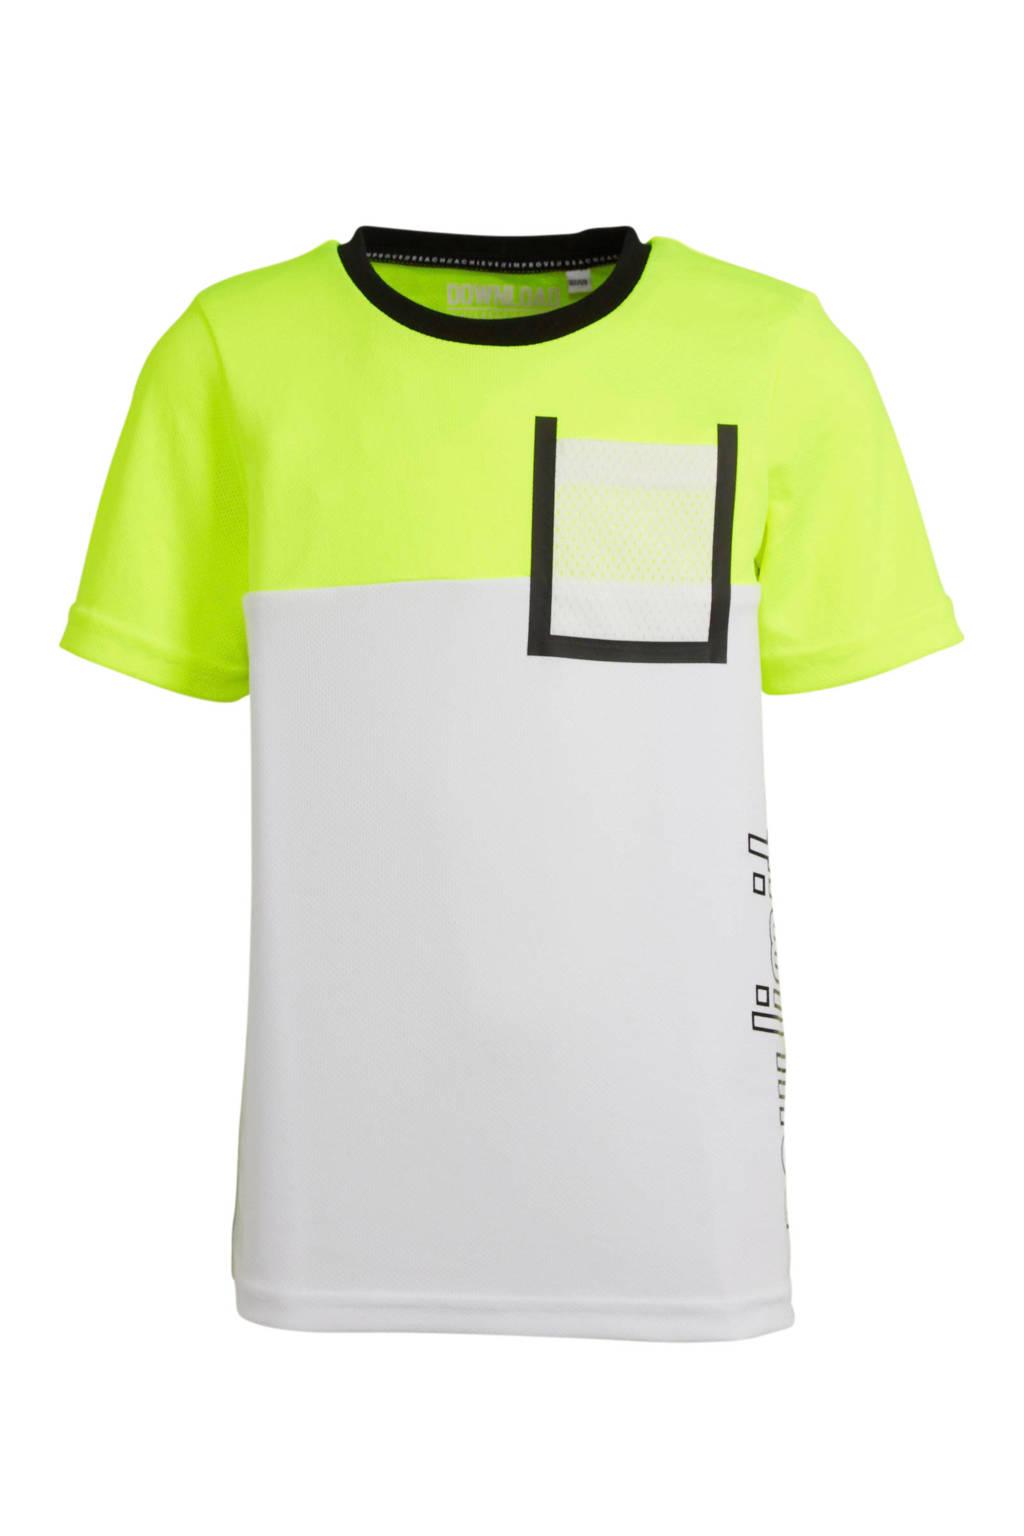 C&A Here & There T-shirt limegroen, Limegroen